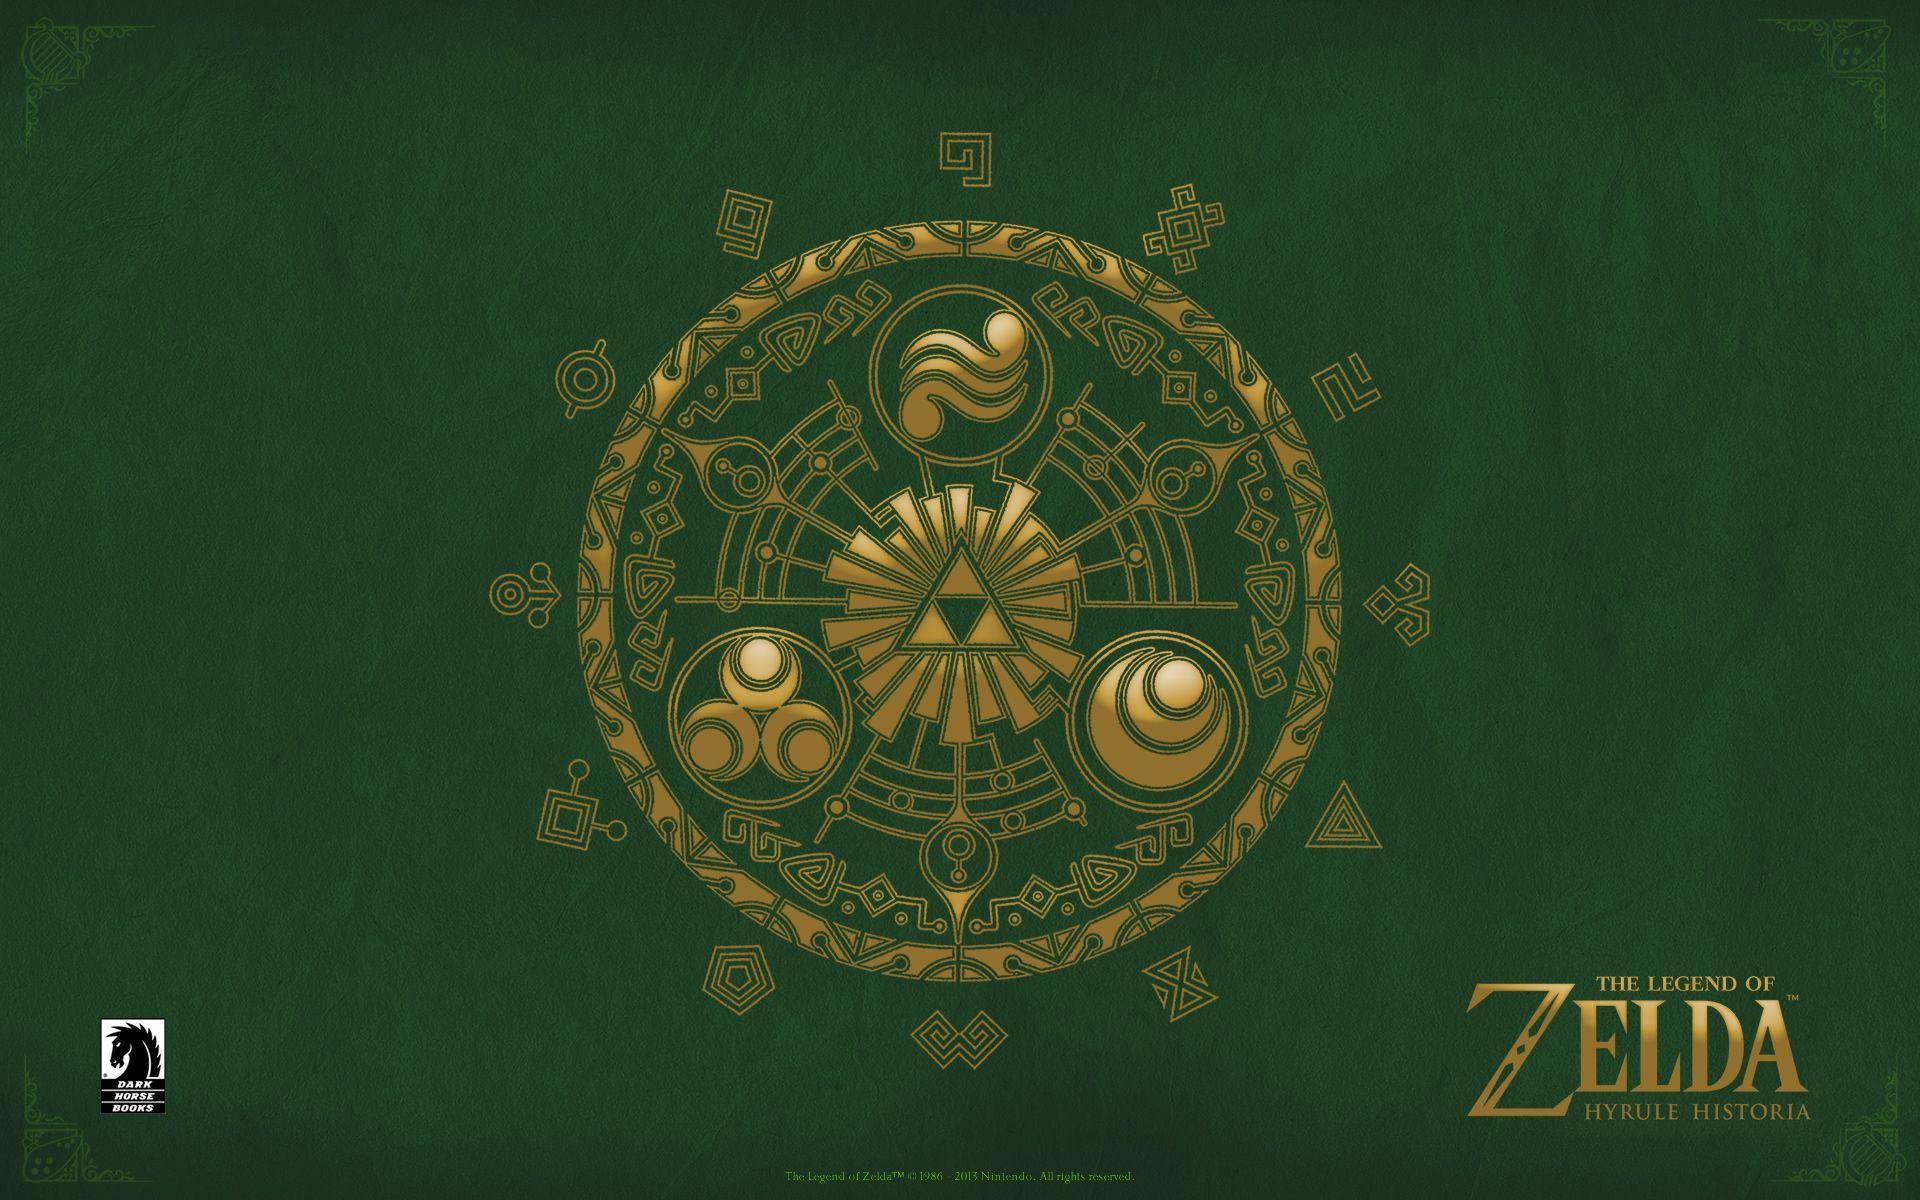 Zelda1 Mag Jpg 1920 1200 I Love The Circular Semi Celtic Look Of The Iconography In This Picture Legend Of Zelda Legend Zelda